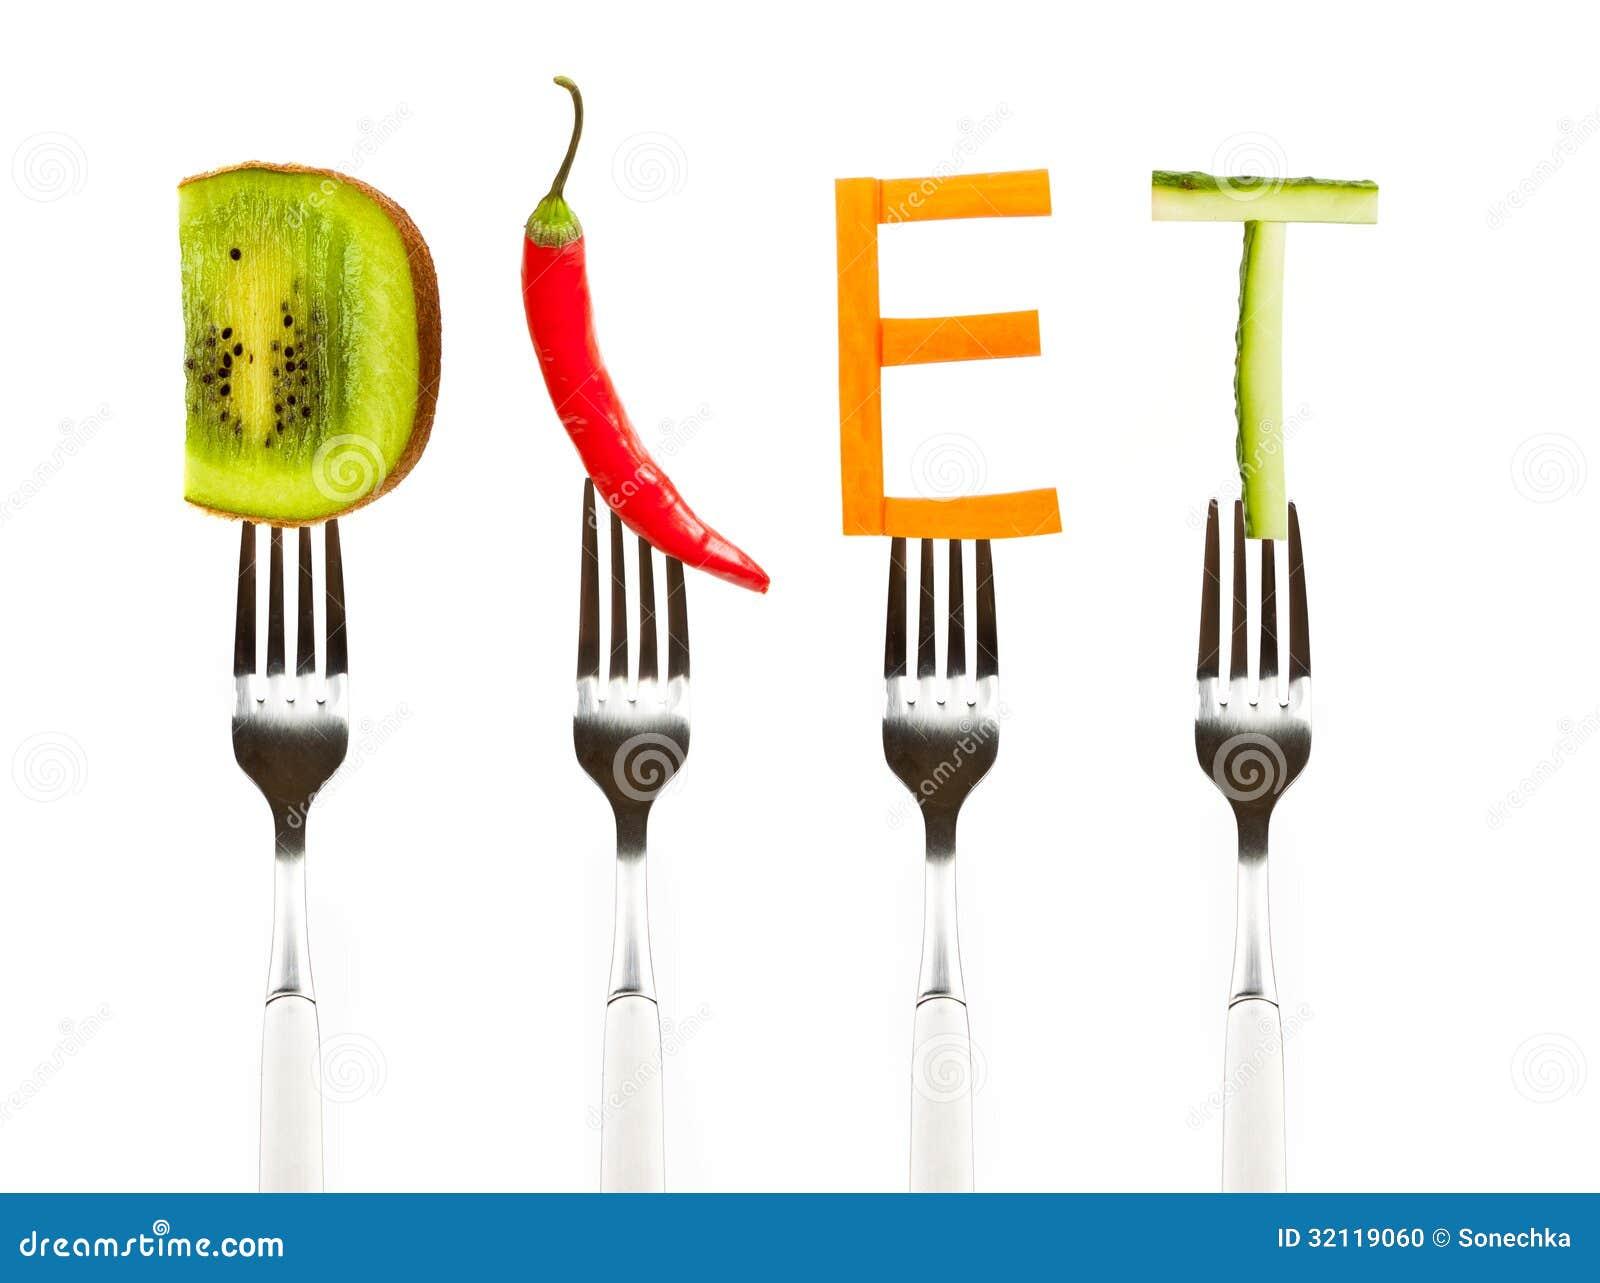 Word diet made of fresh tasty vegetables on forks